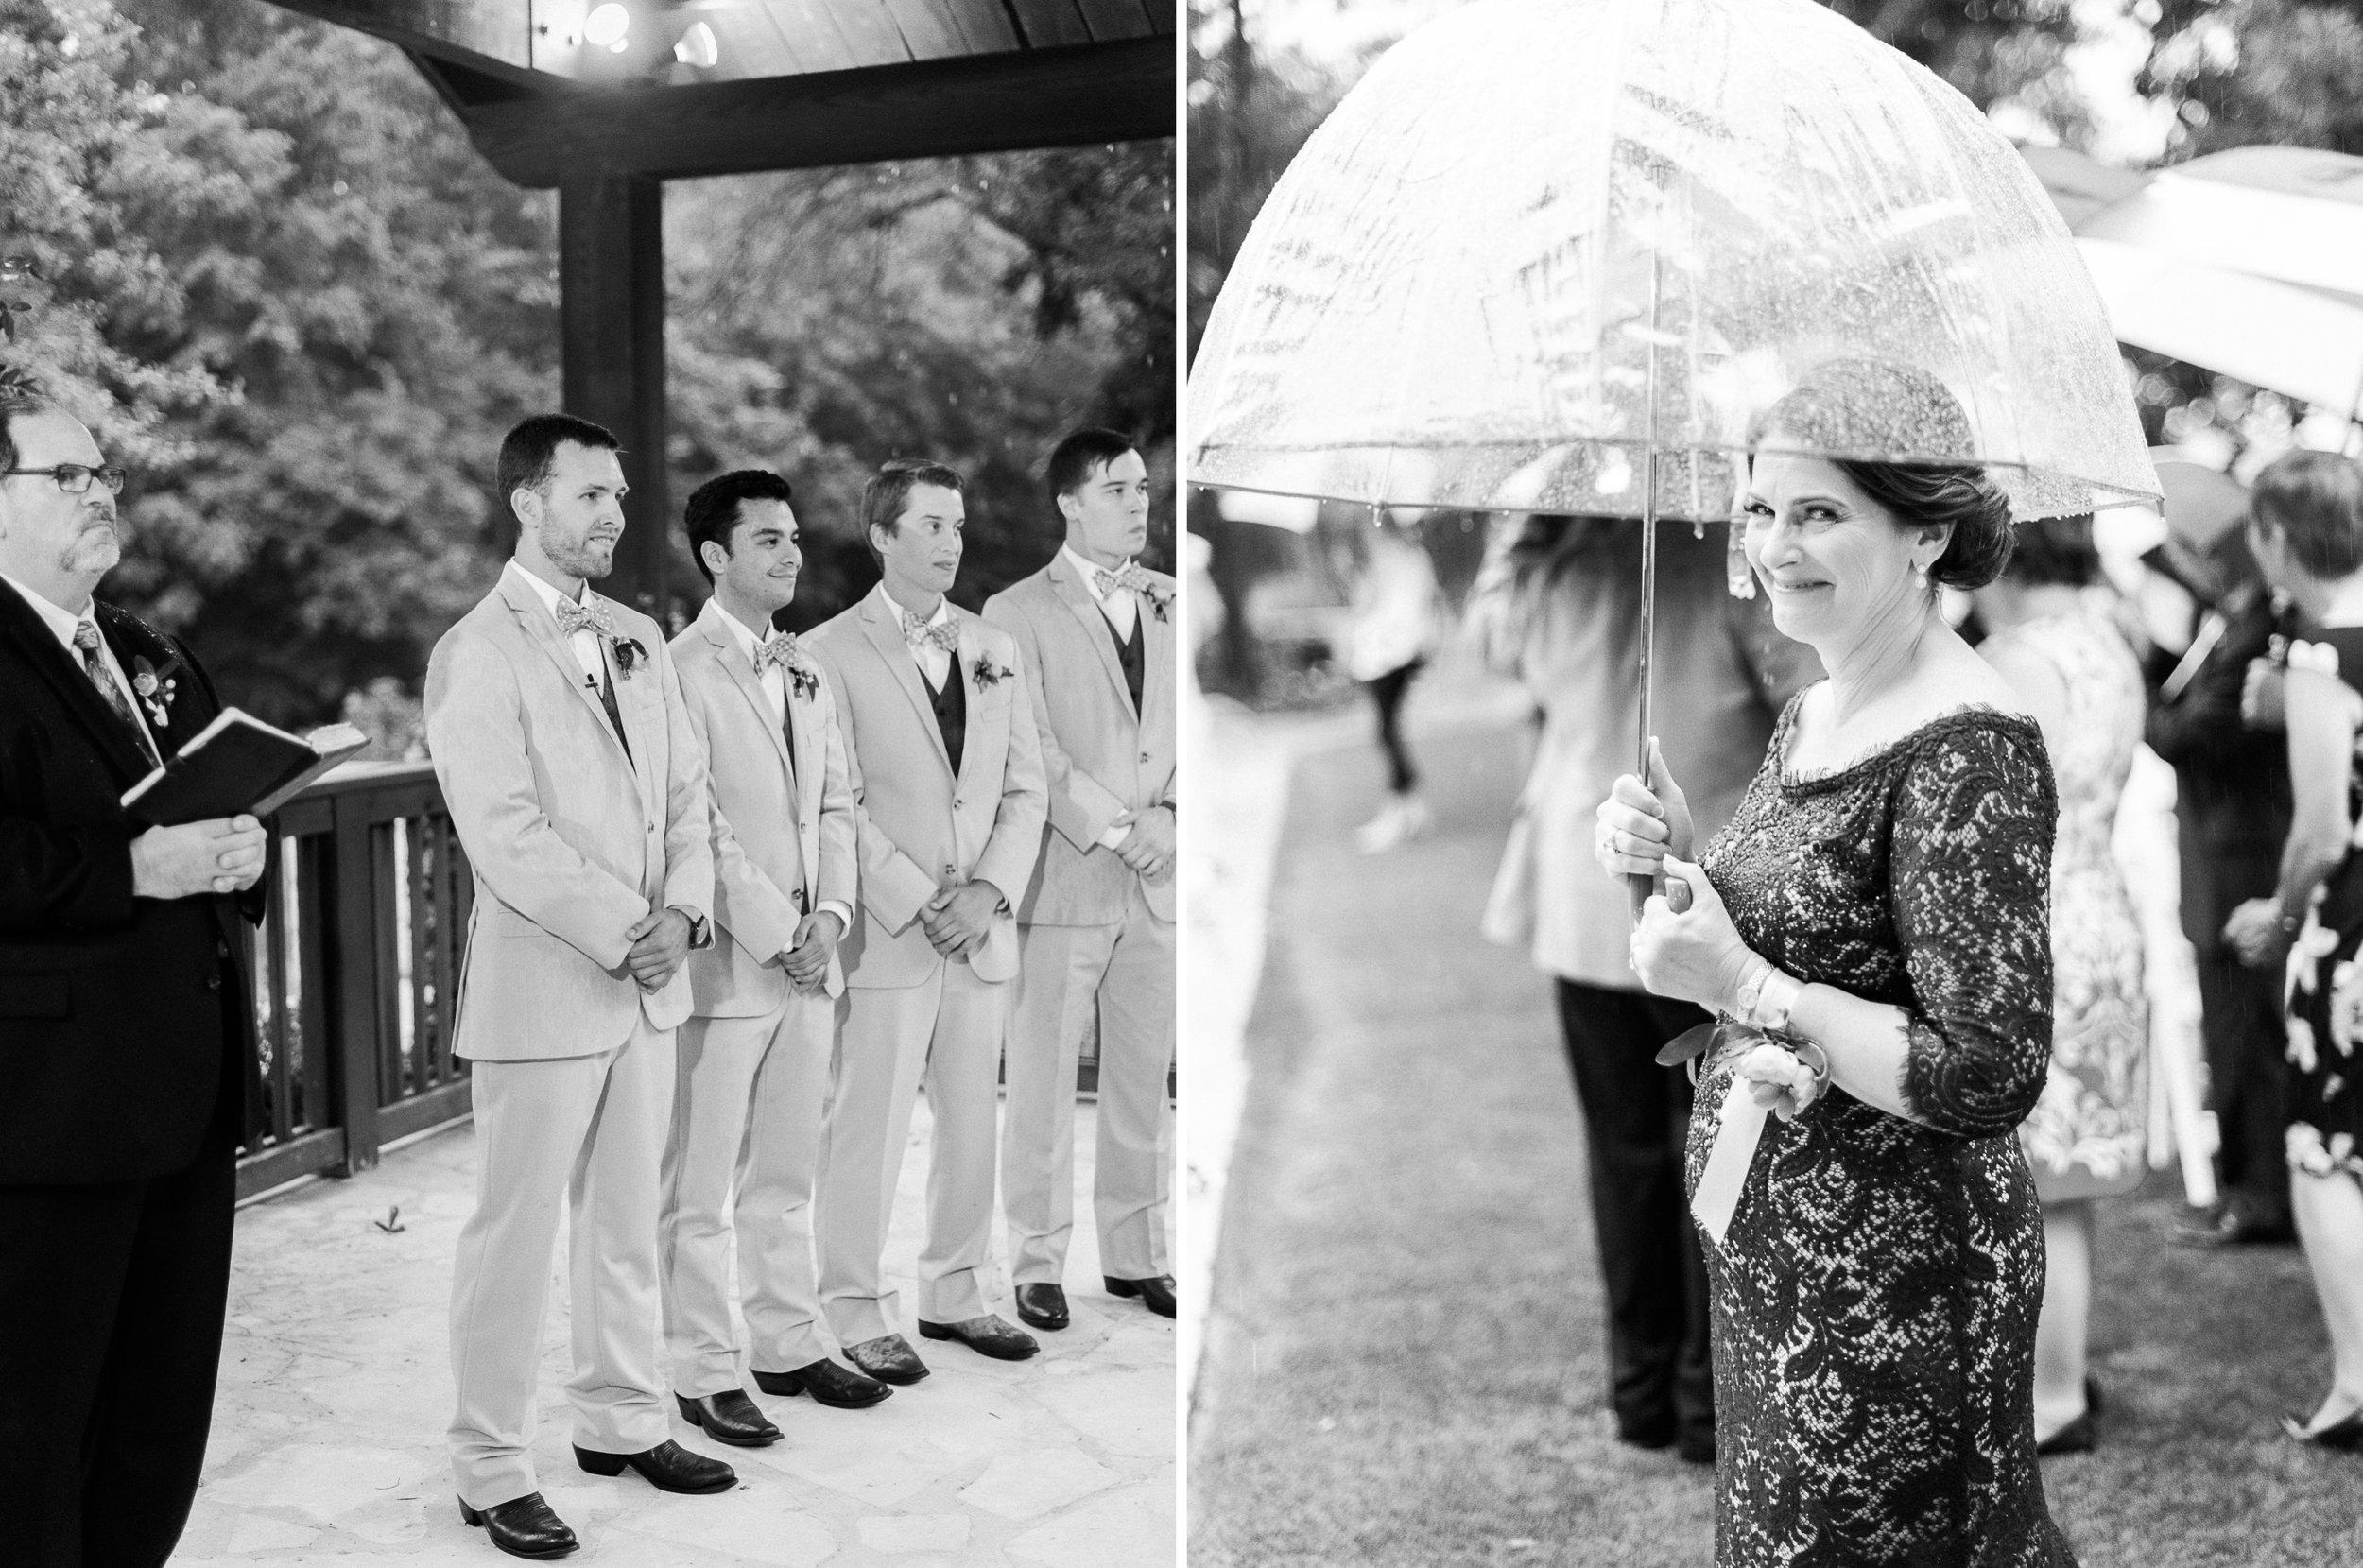 The-Knot-Wedding-Houston-Photographer-Fine-Art-Dana-Fernandez-Photography-Film-120 copy.jpg